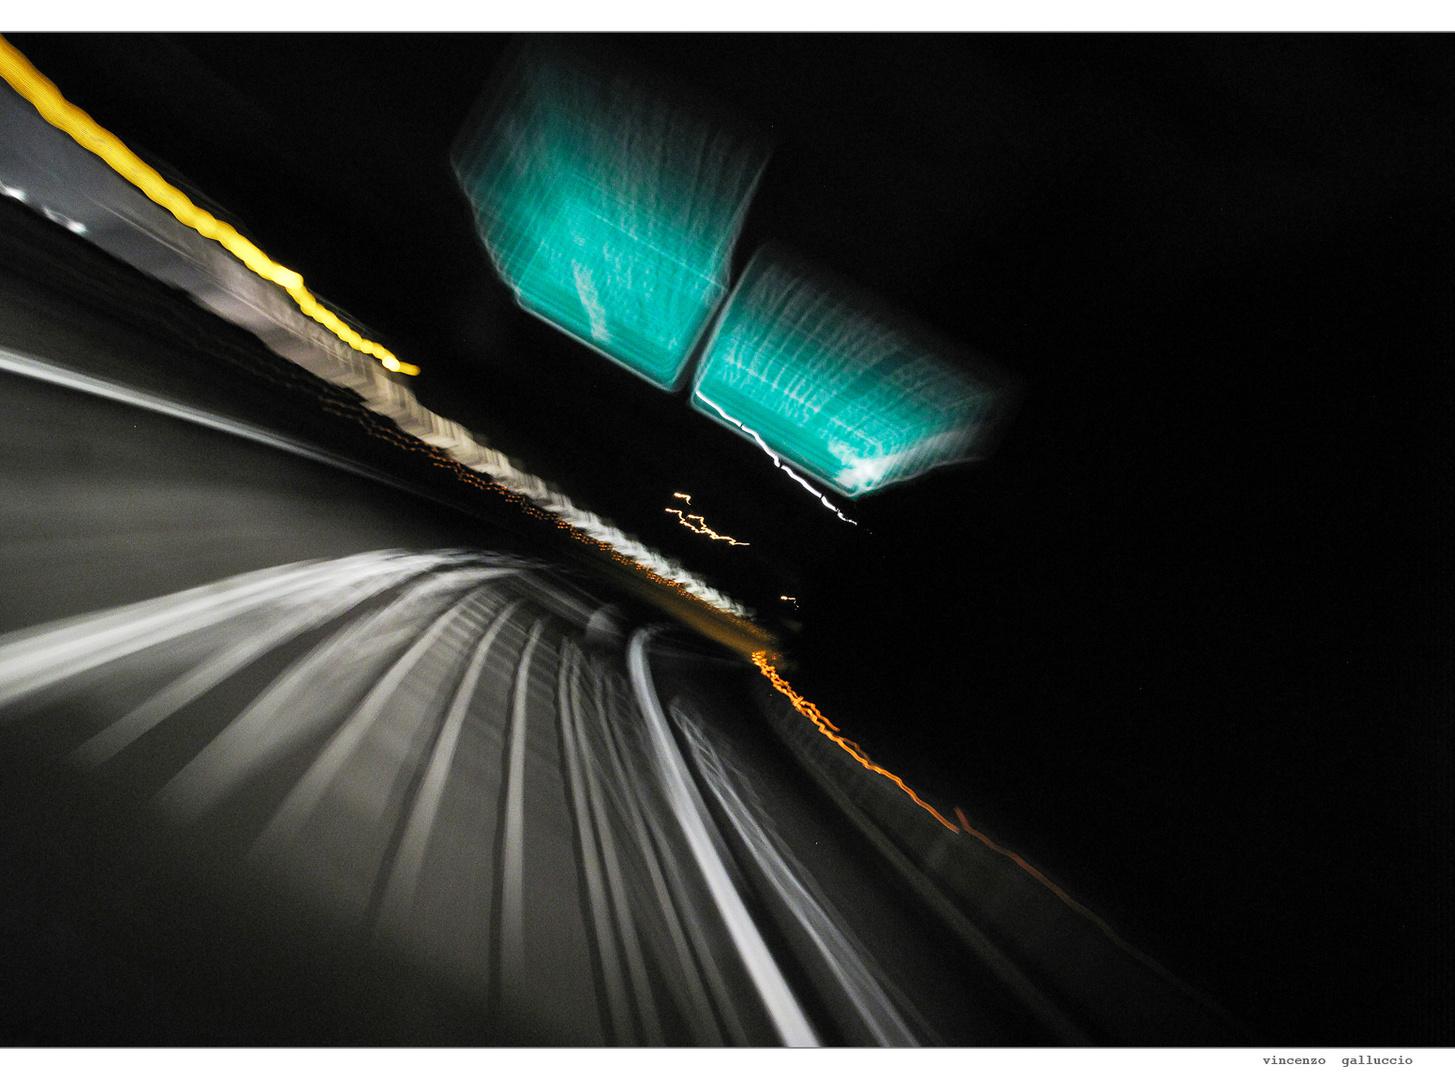 Autostrada#0016